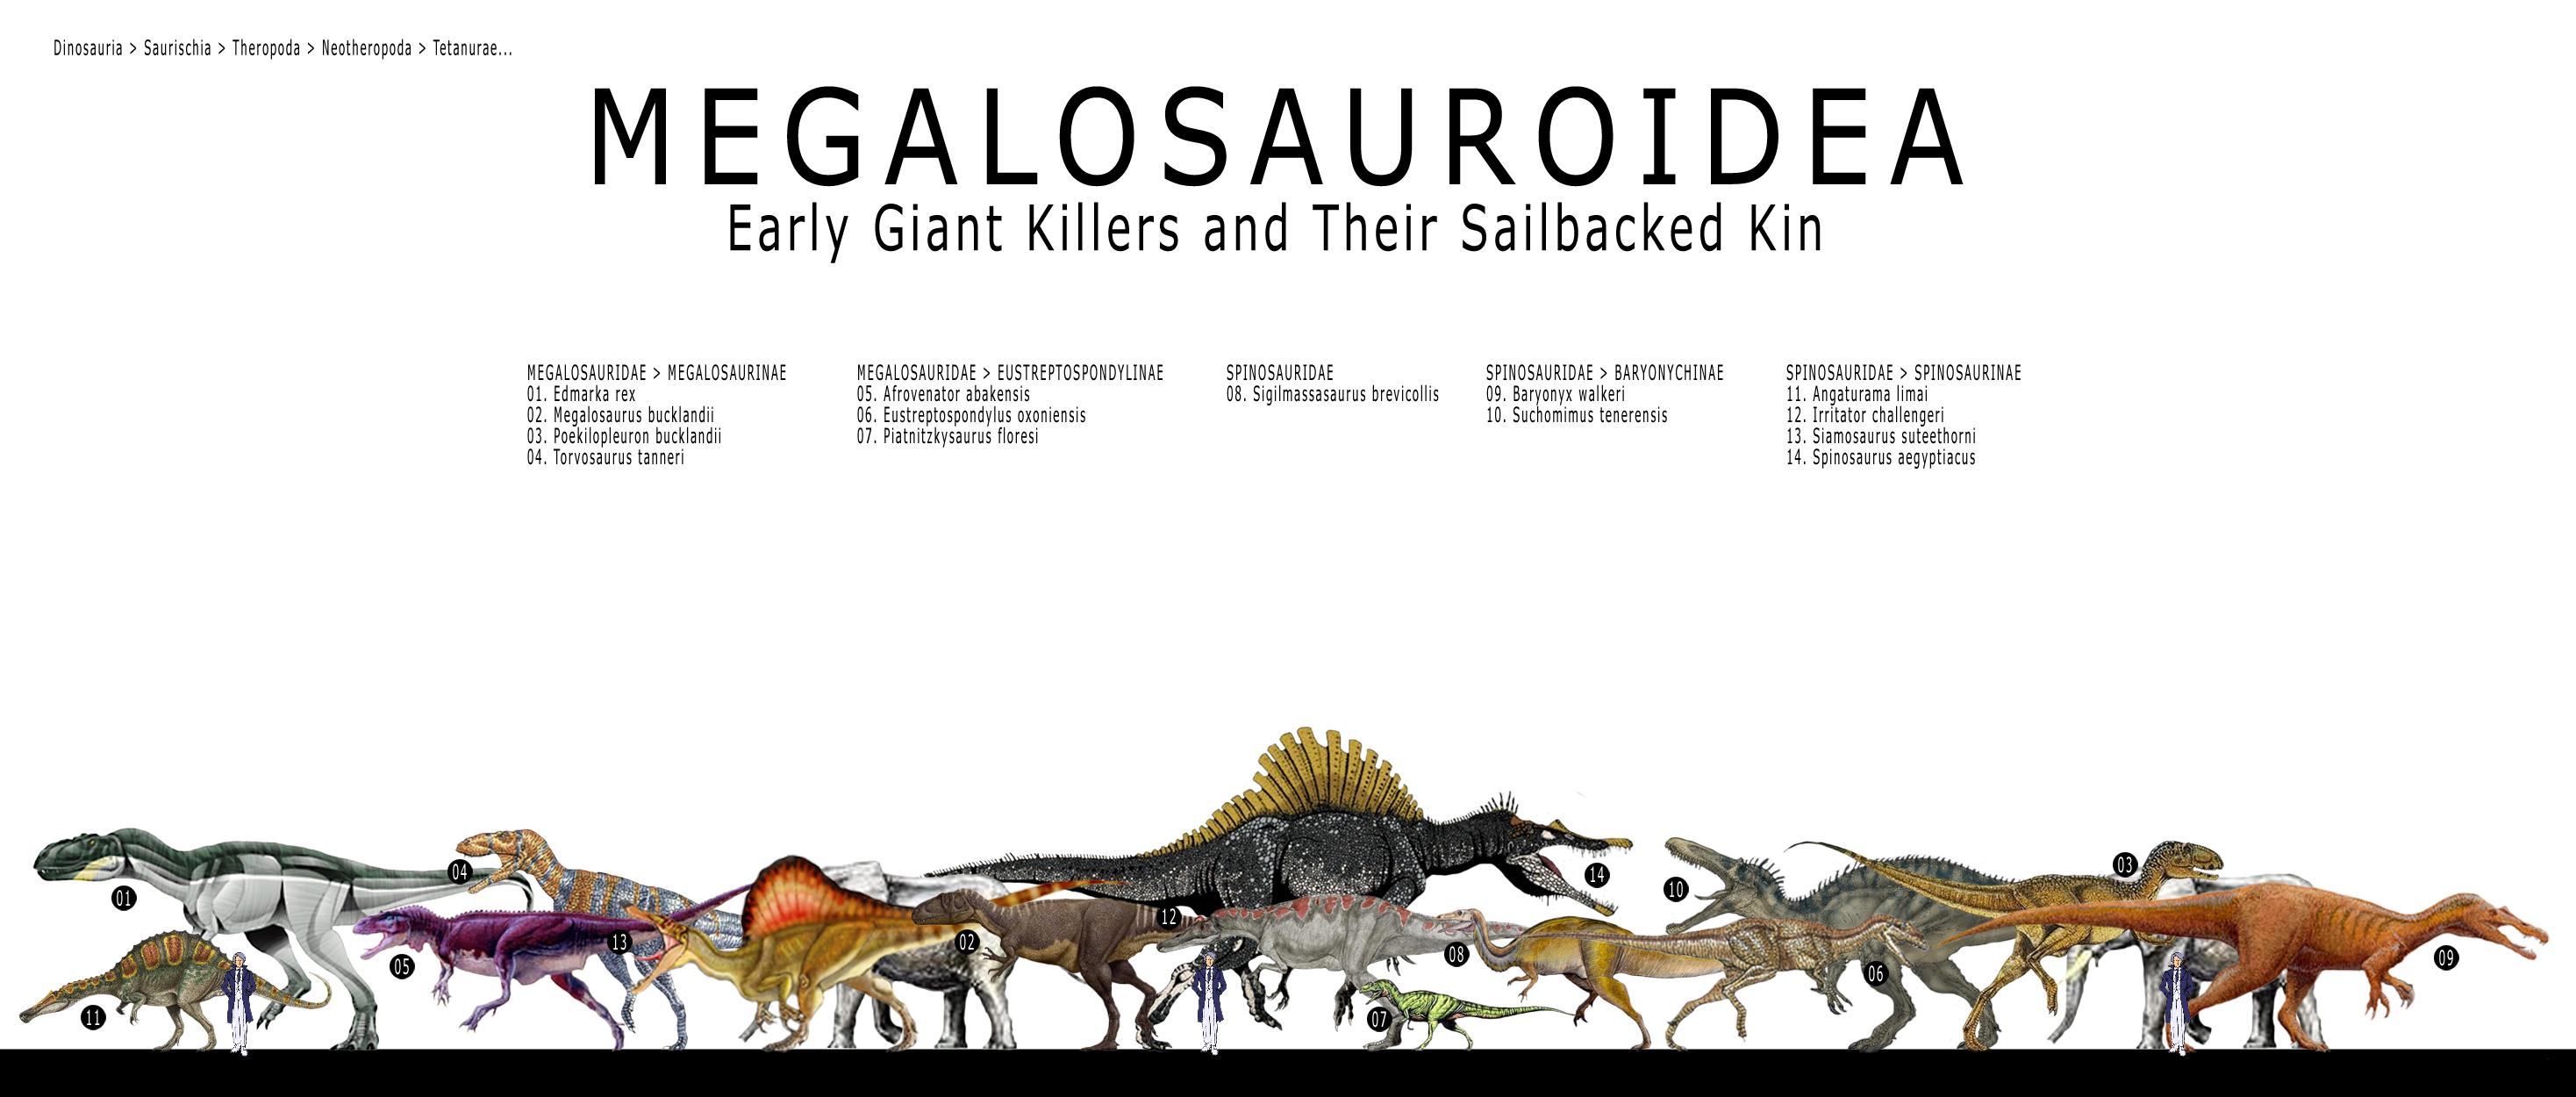 DSC_Megalosauroidea.jpg